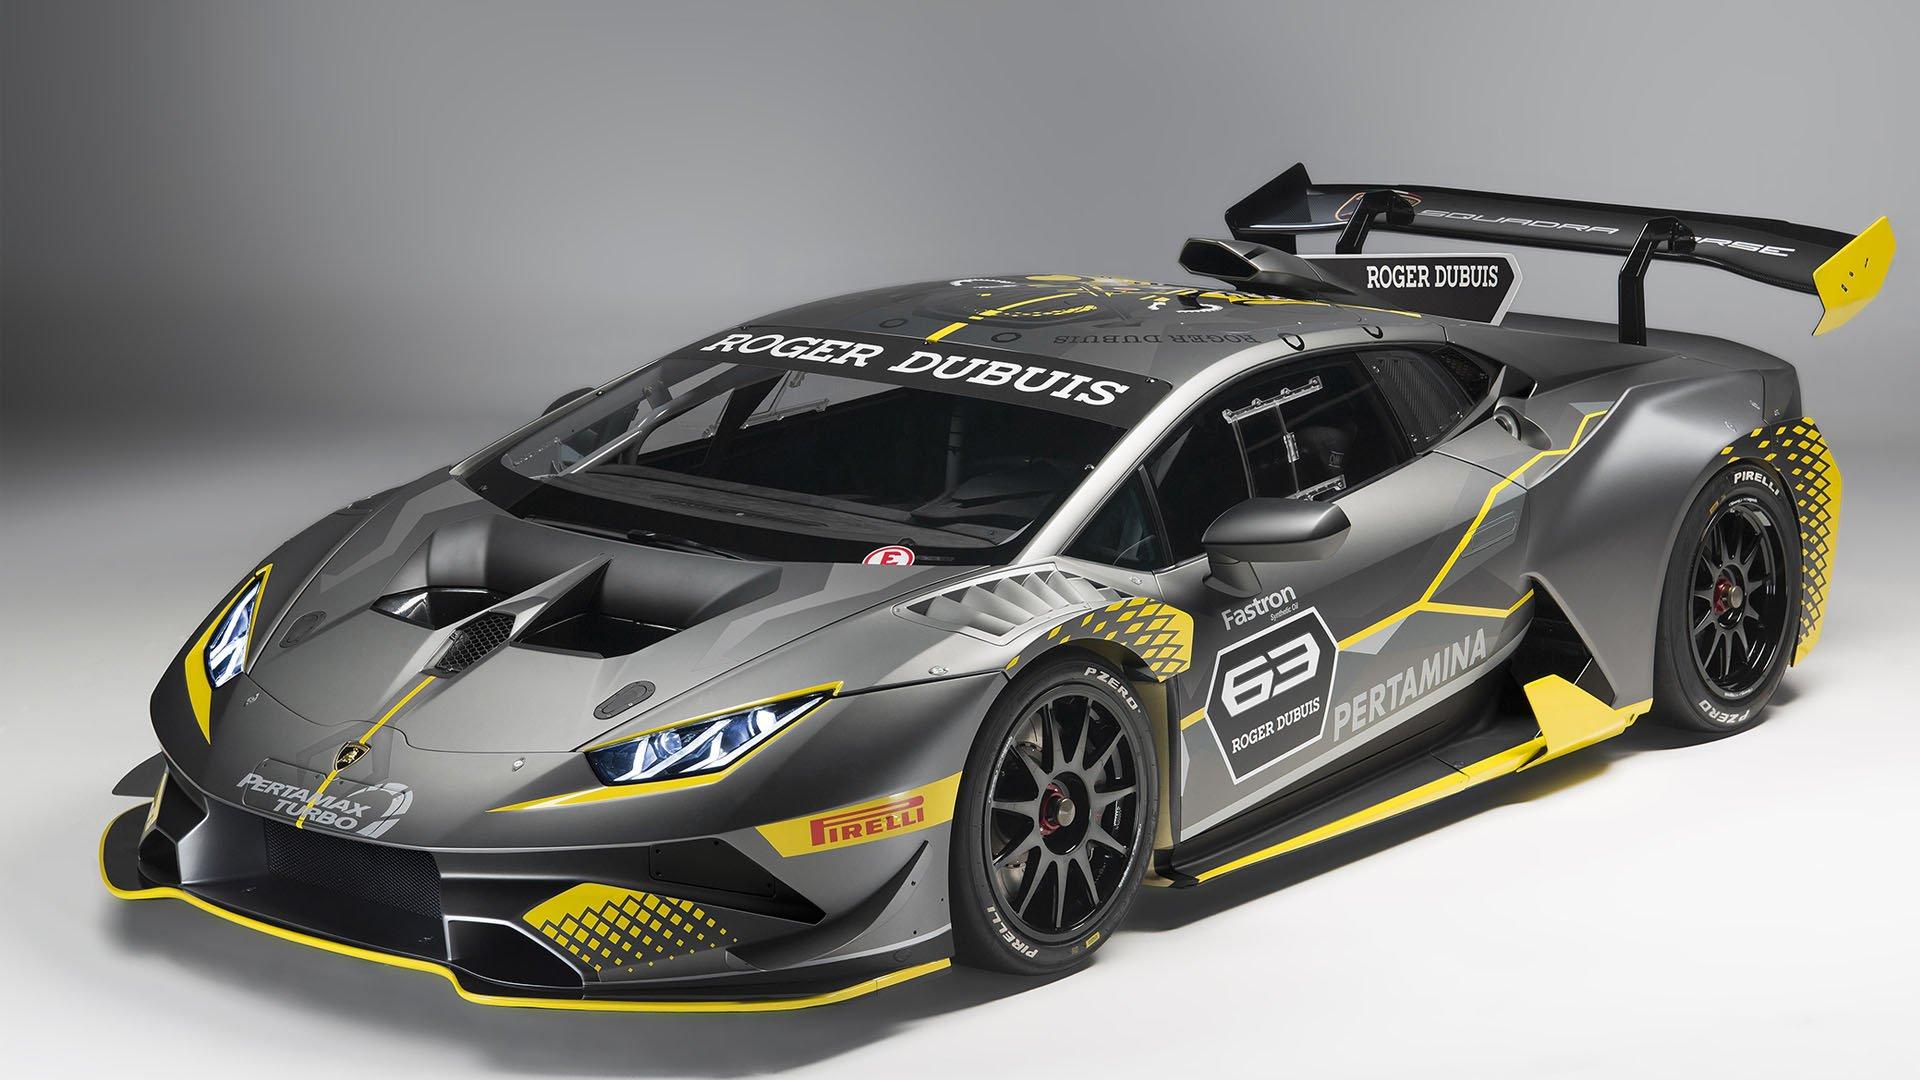 The 2017 Lamborghini Huracán Super Trofeo EVO and a partnership with Roger Dubuis